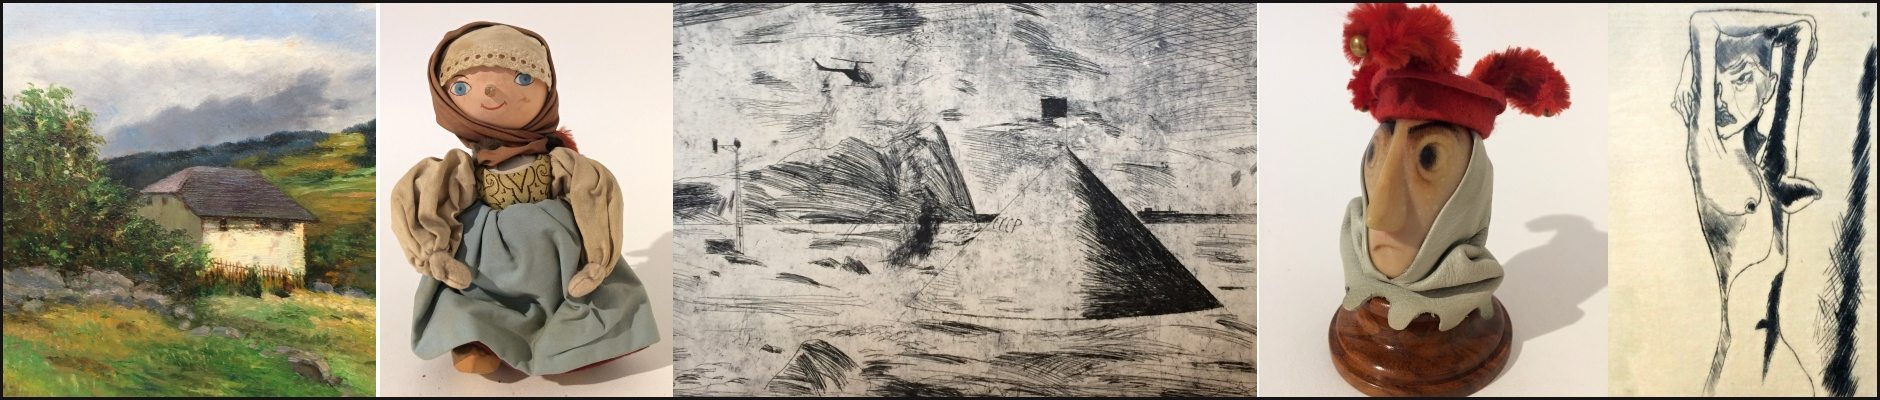 XII. Aukce obrazy, kresby, grafiky, loutky